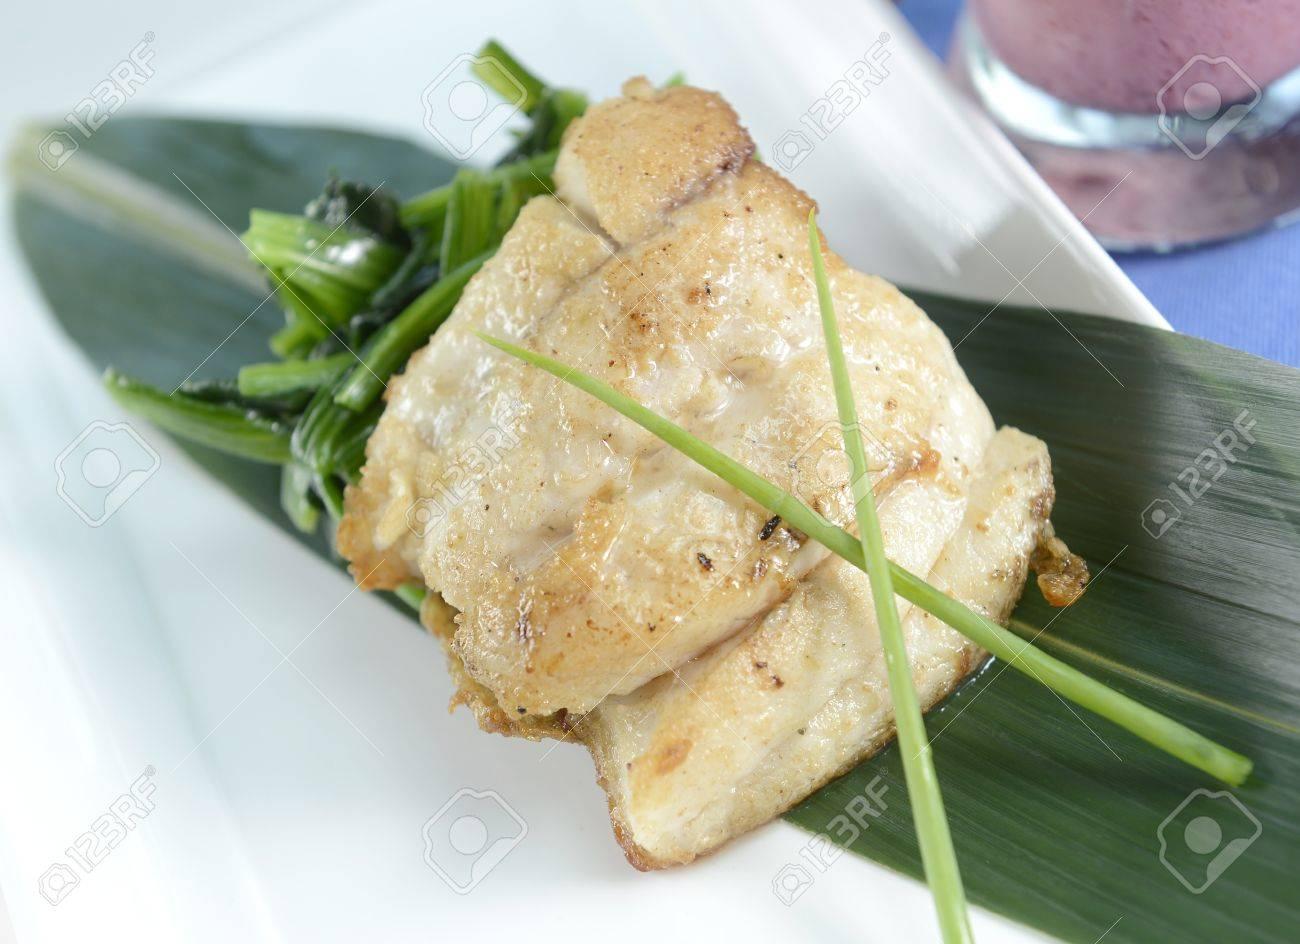 fish steak Stock Photo - 15396448